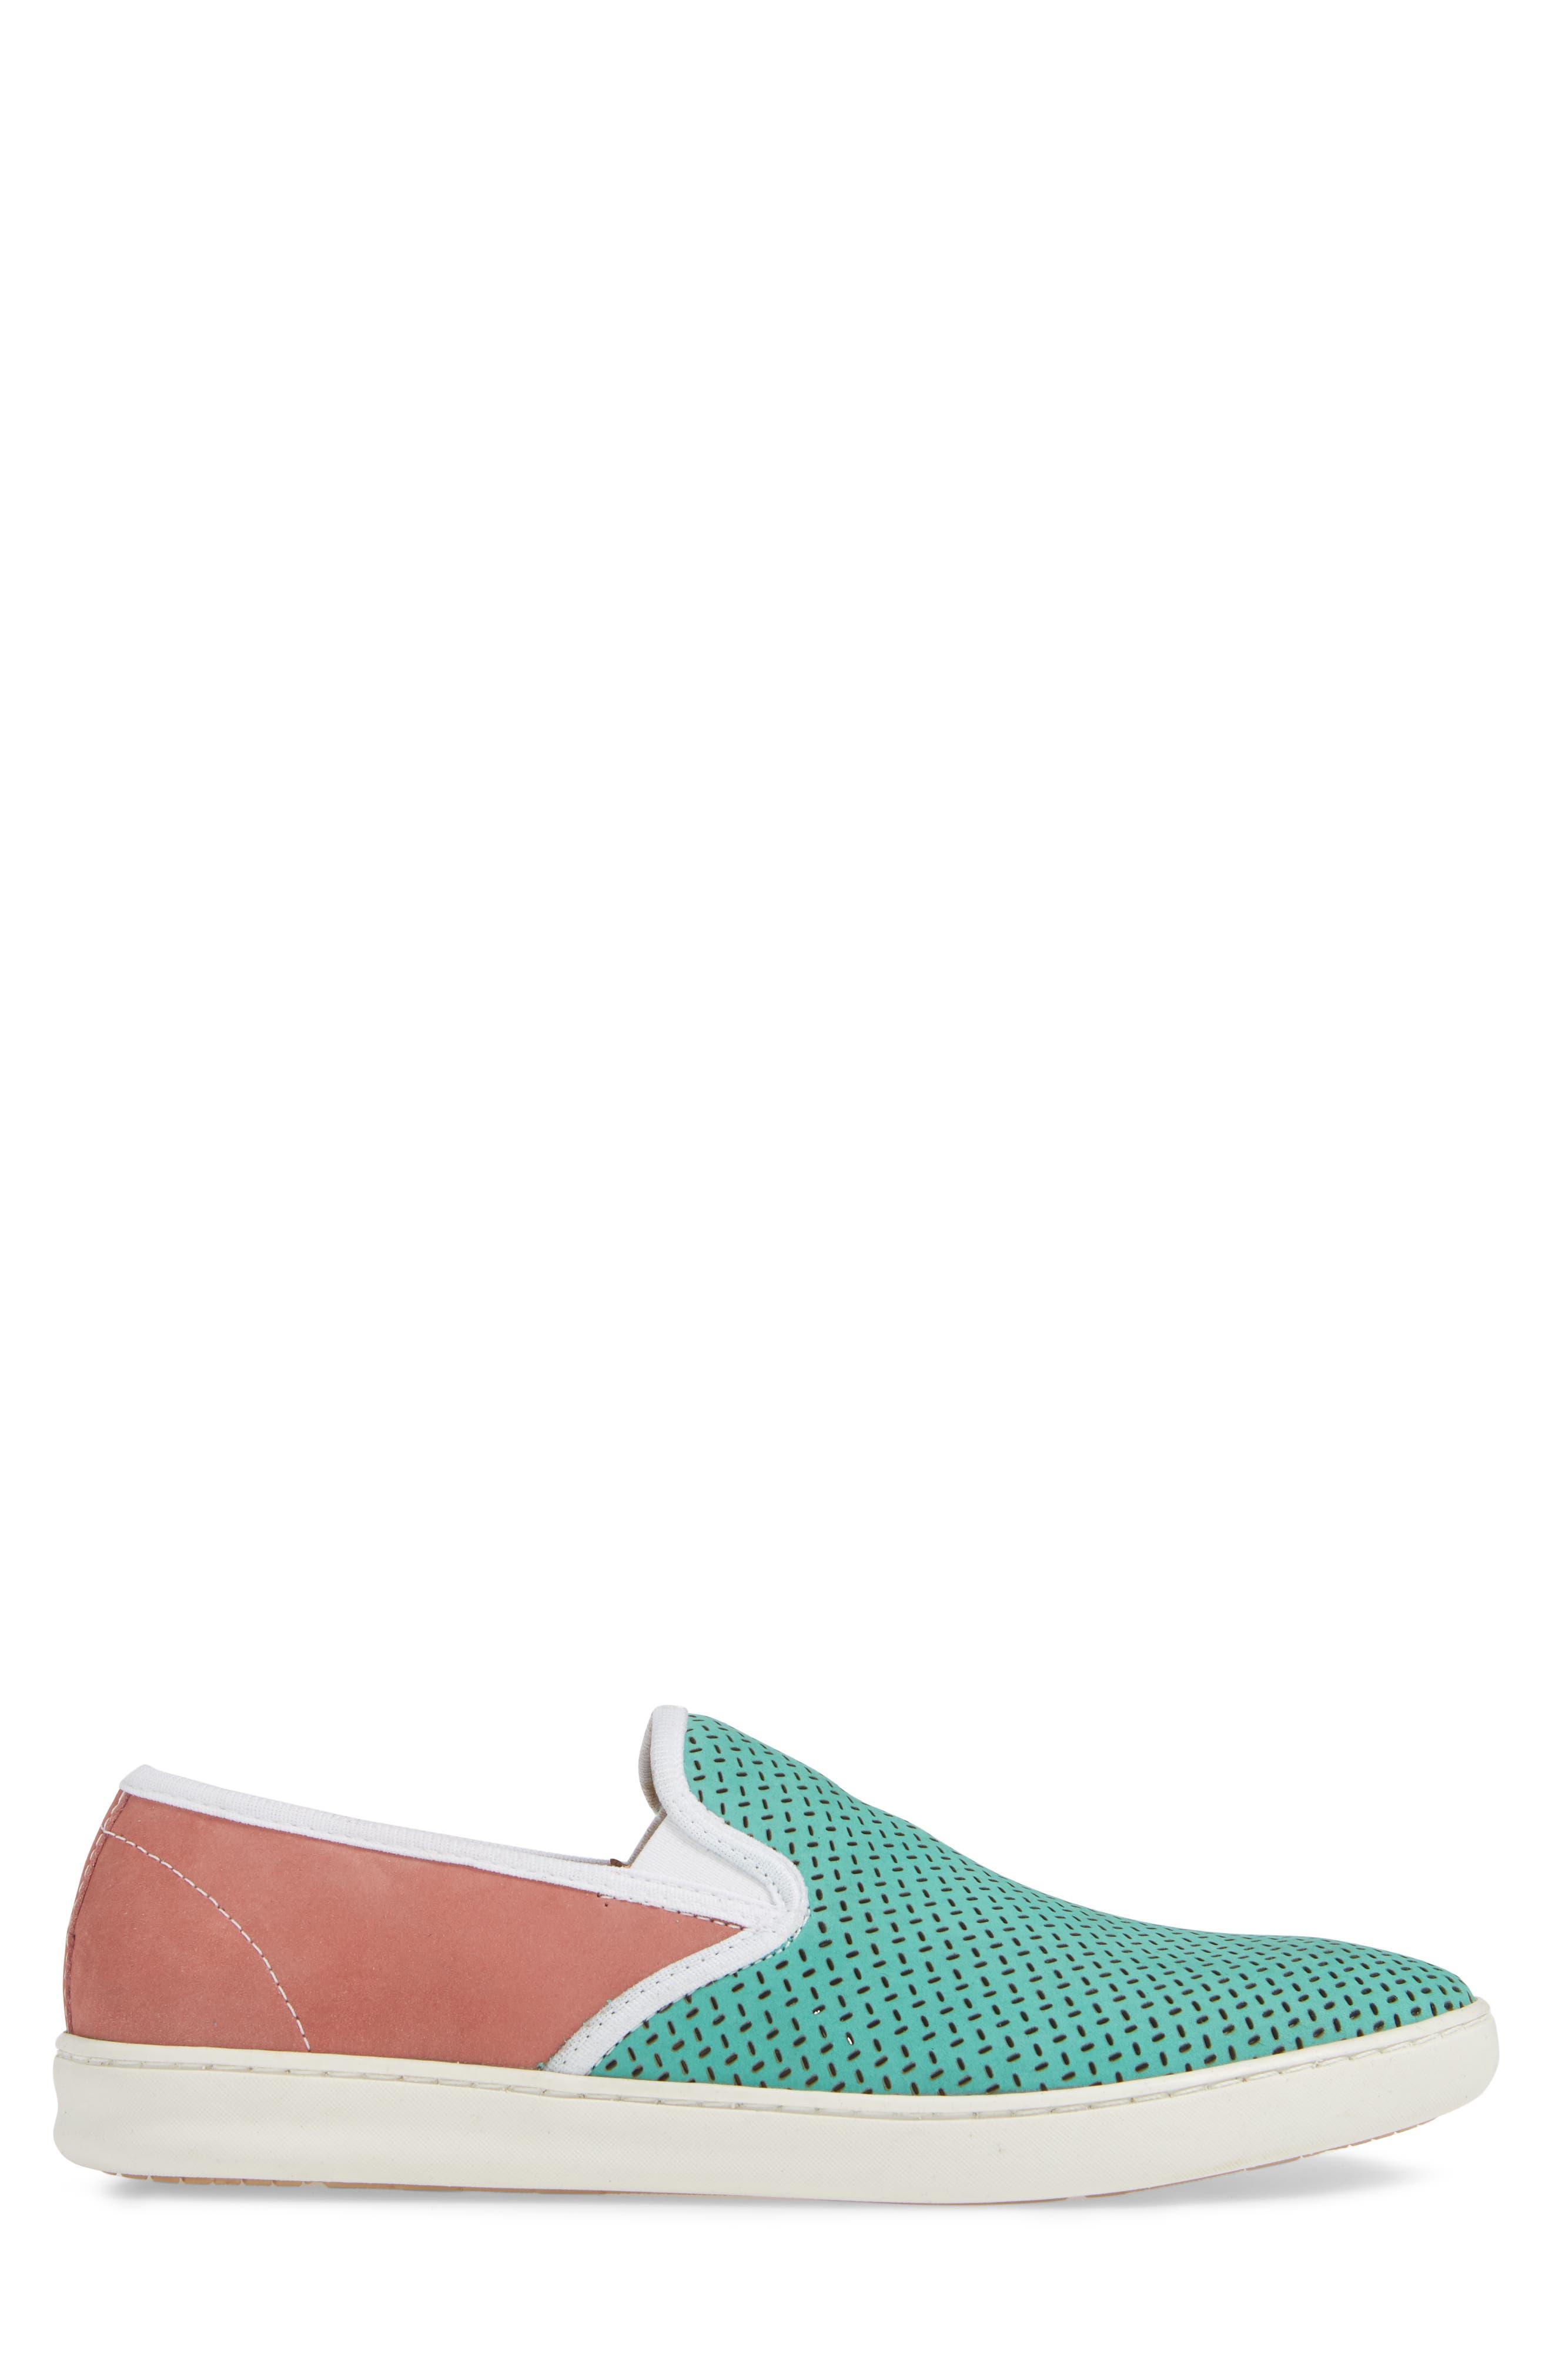 Malibu Perforated Loafer,                             Alternate thumbnail 3, color,                             AQUA/PINK NUBUCK